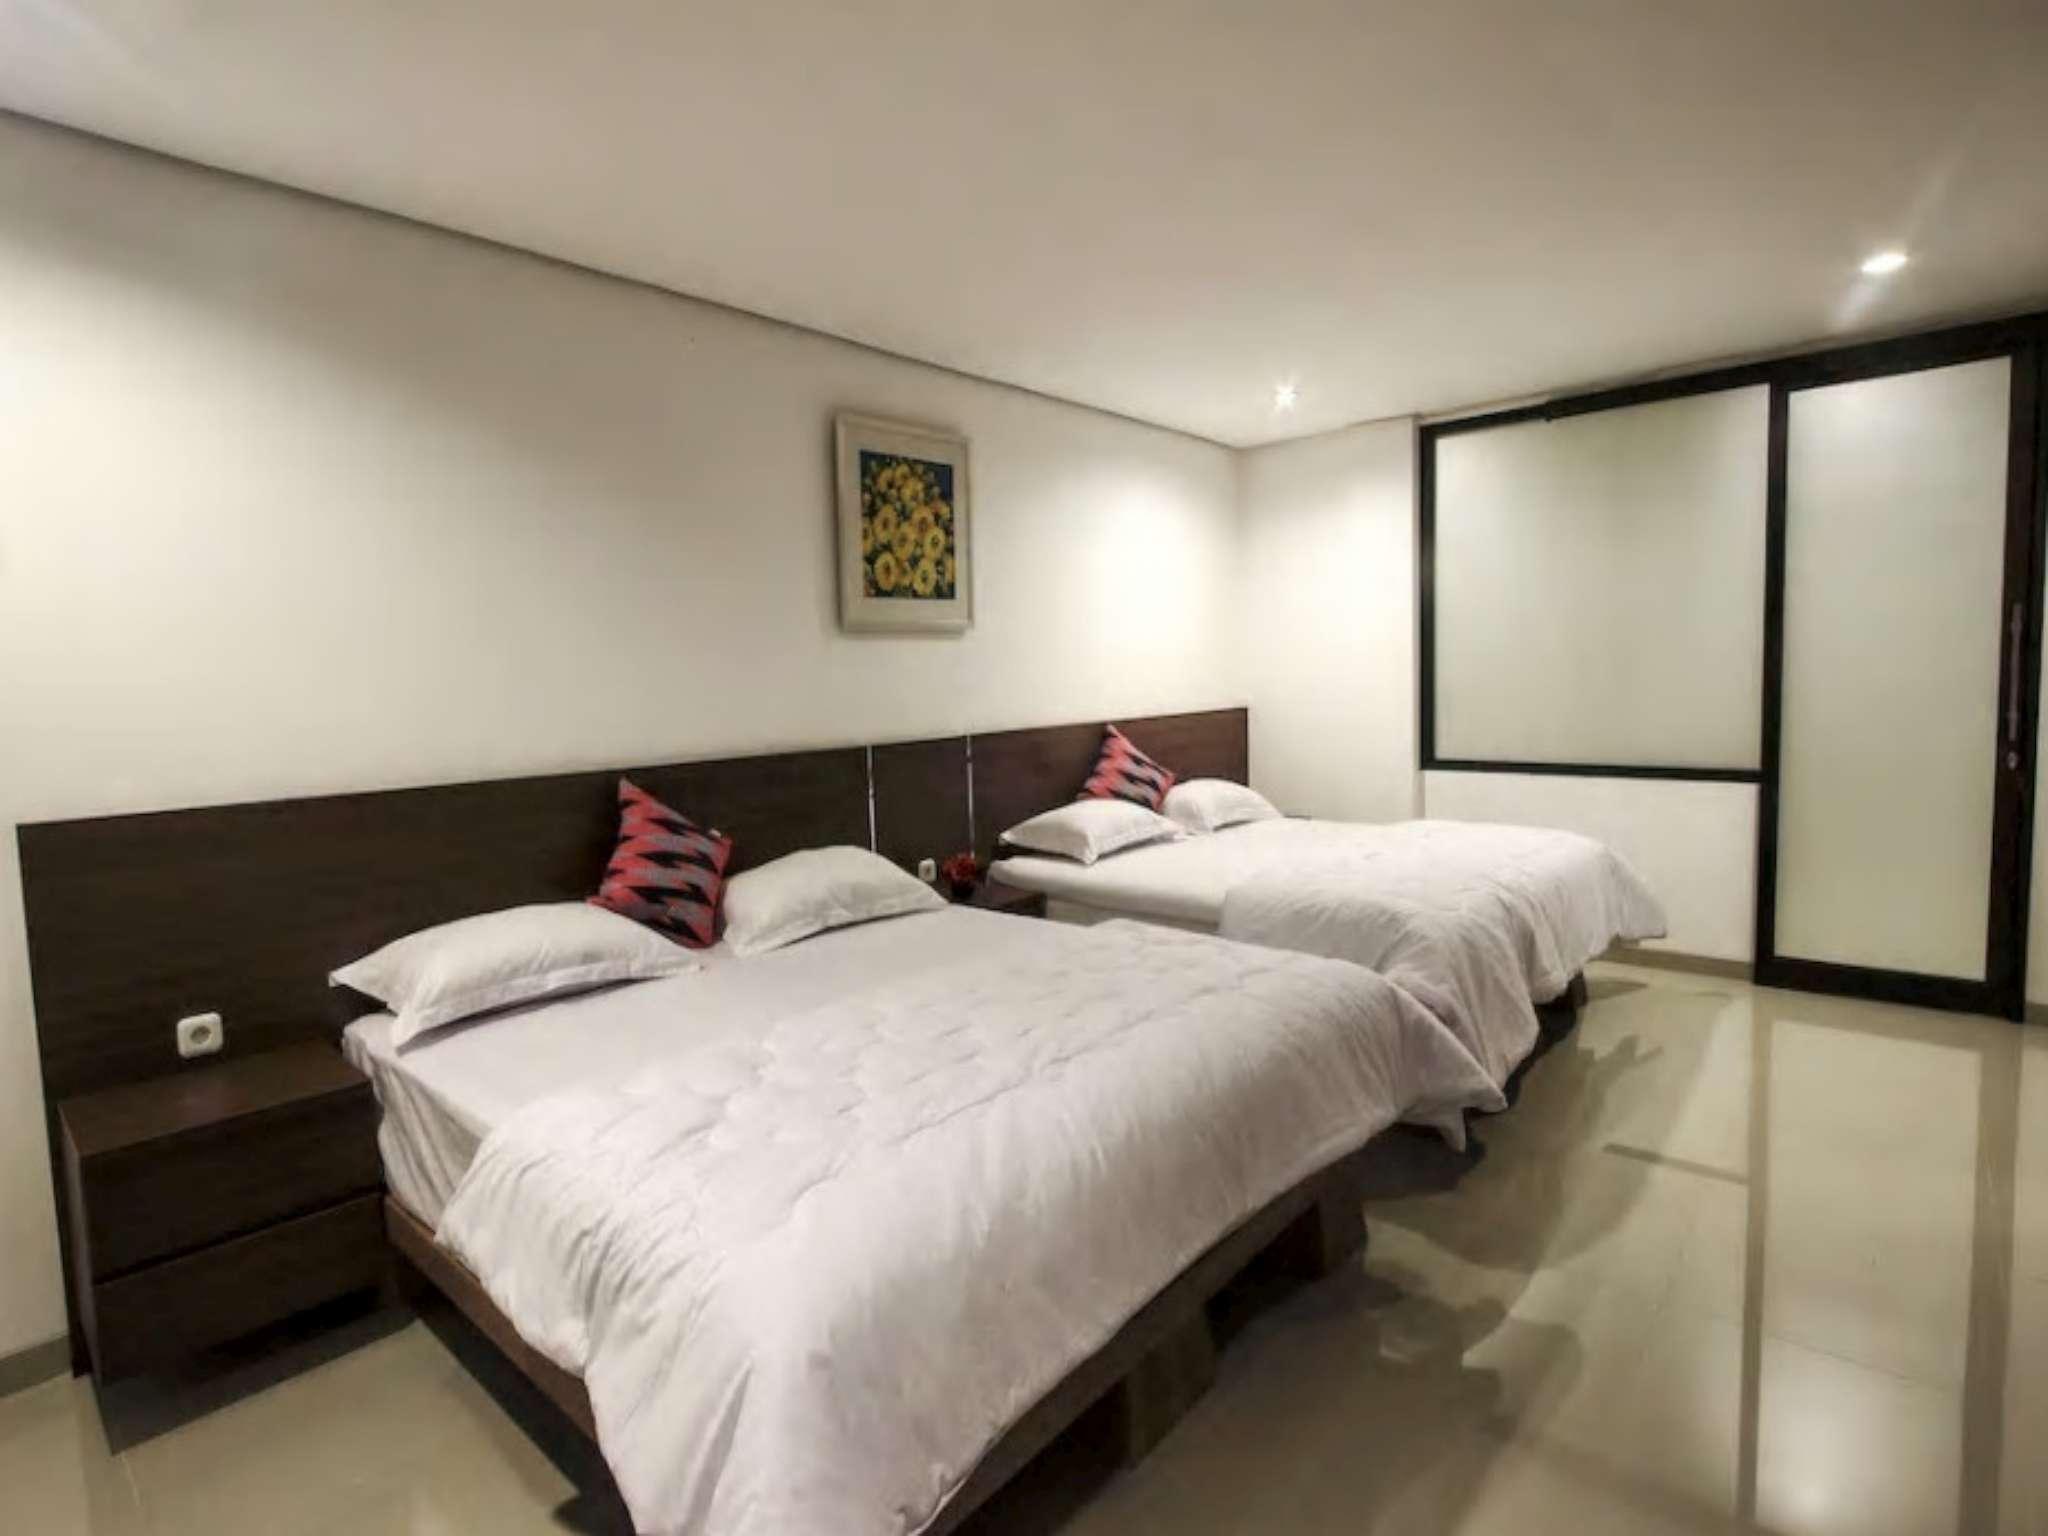 Hotel De Reiz Villa Kencana Syariah - Jl.Bukit Kencana No.39, Cluster Graha Kencana, Resort Dago Pakar - Bandung